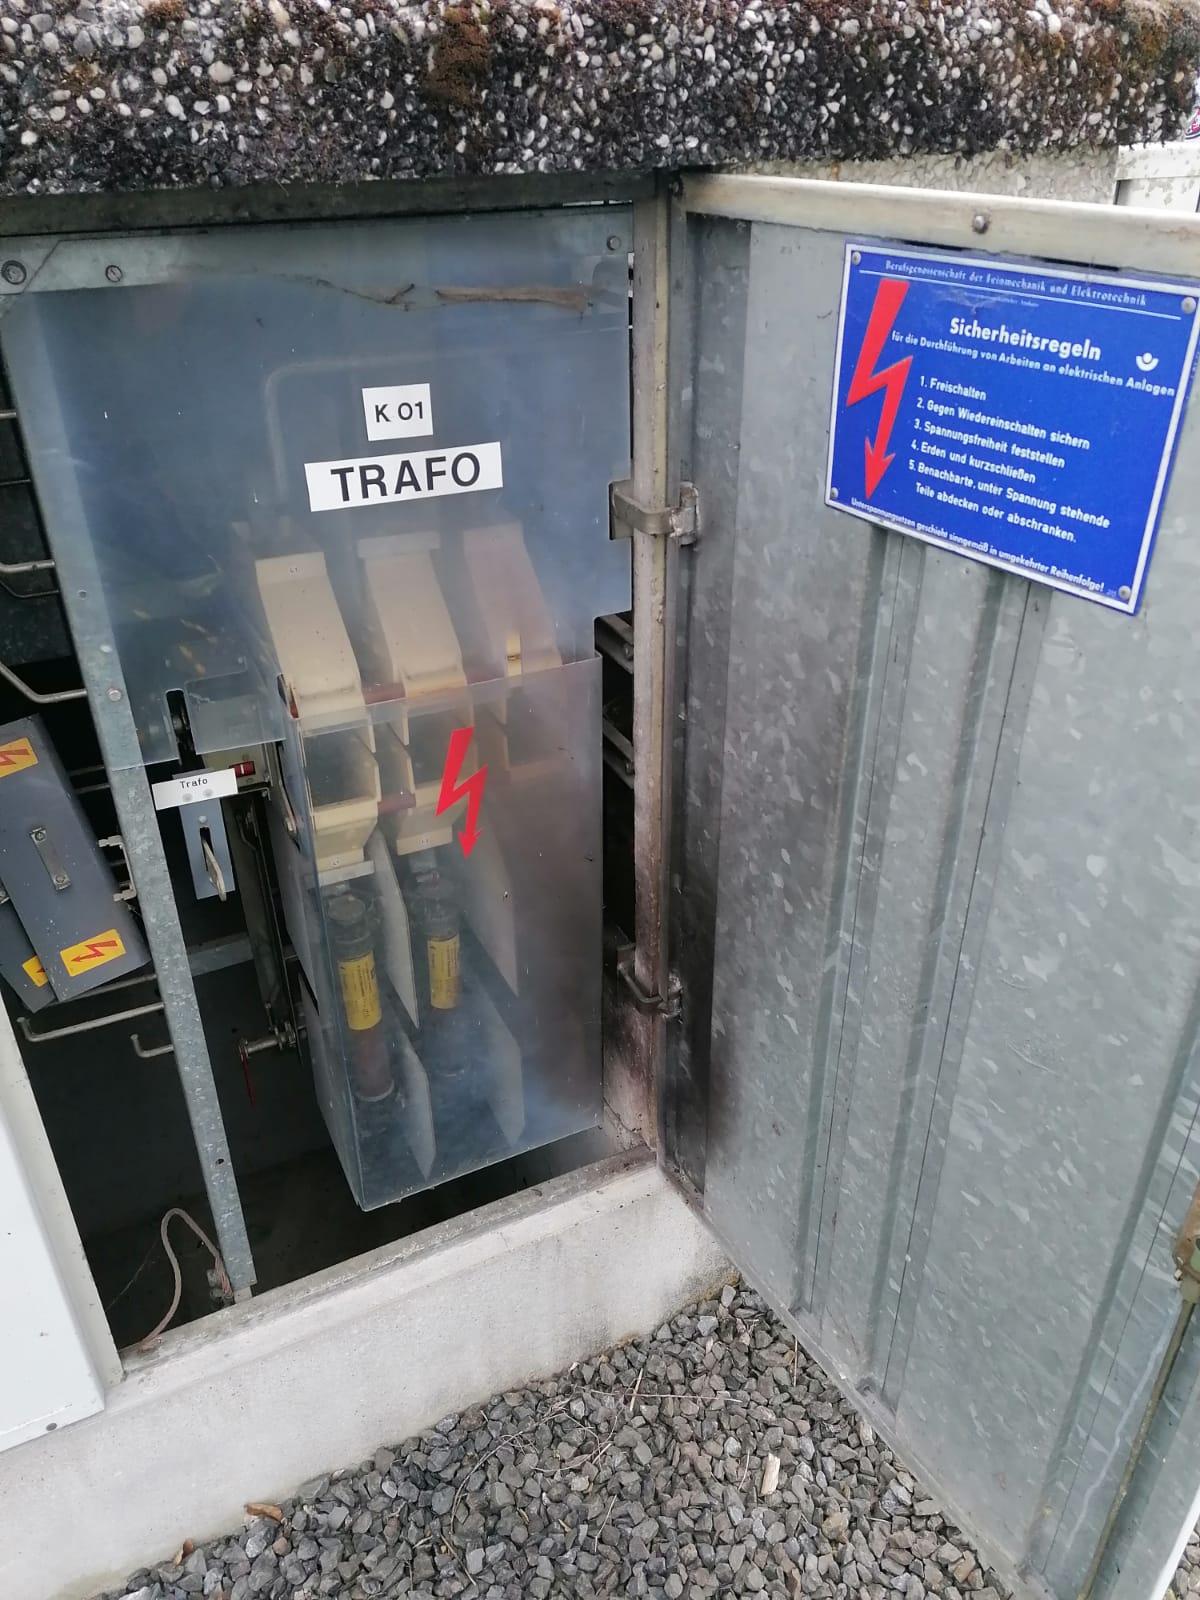 Brandspuren in 10 kV Trafostation